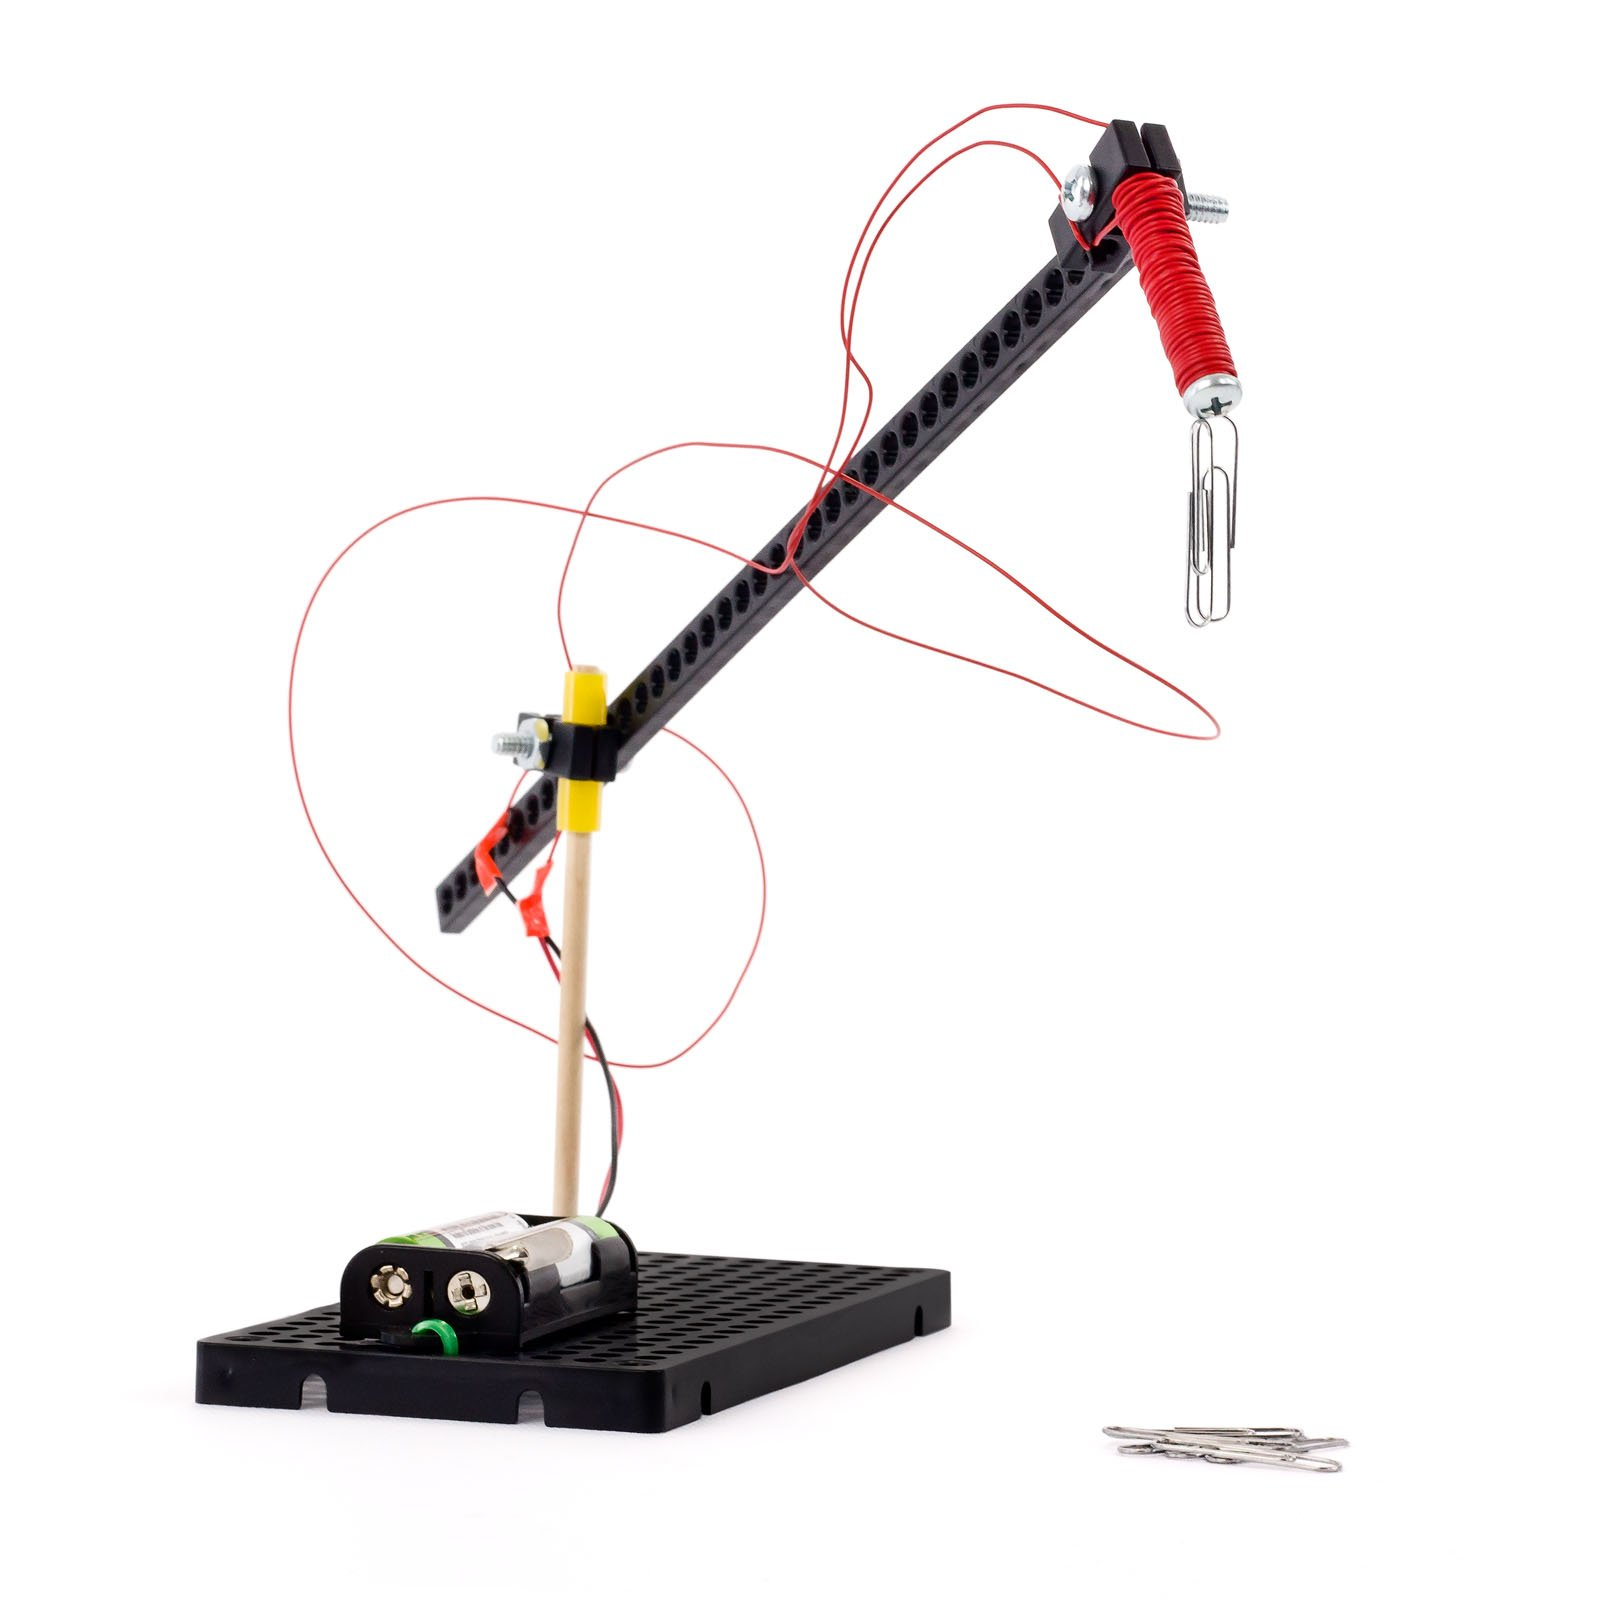 TeacherGeek DIY Electromagnetic Crane STEM | STEAM Activity Kit